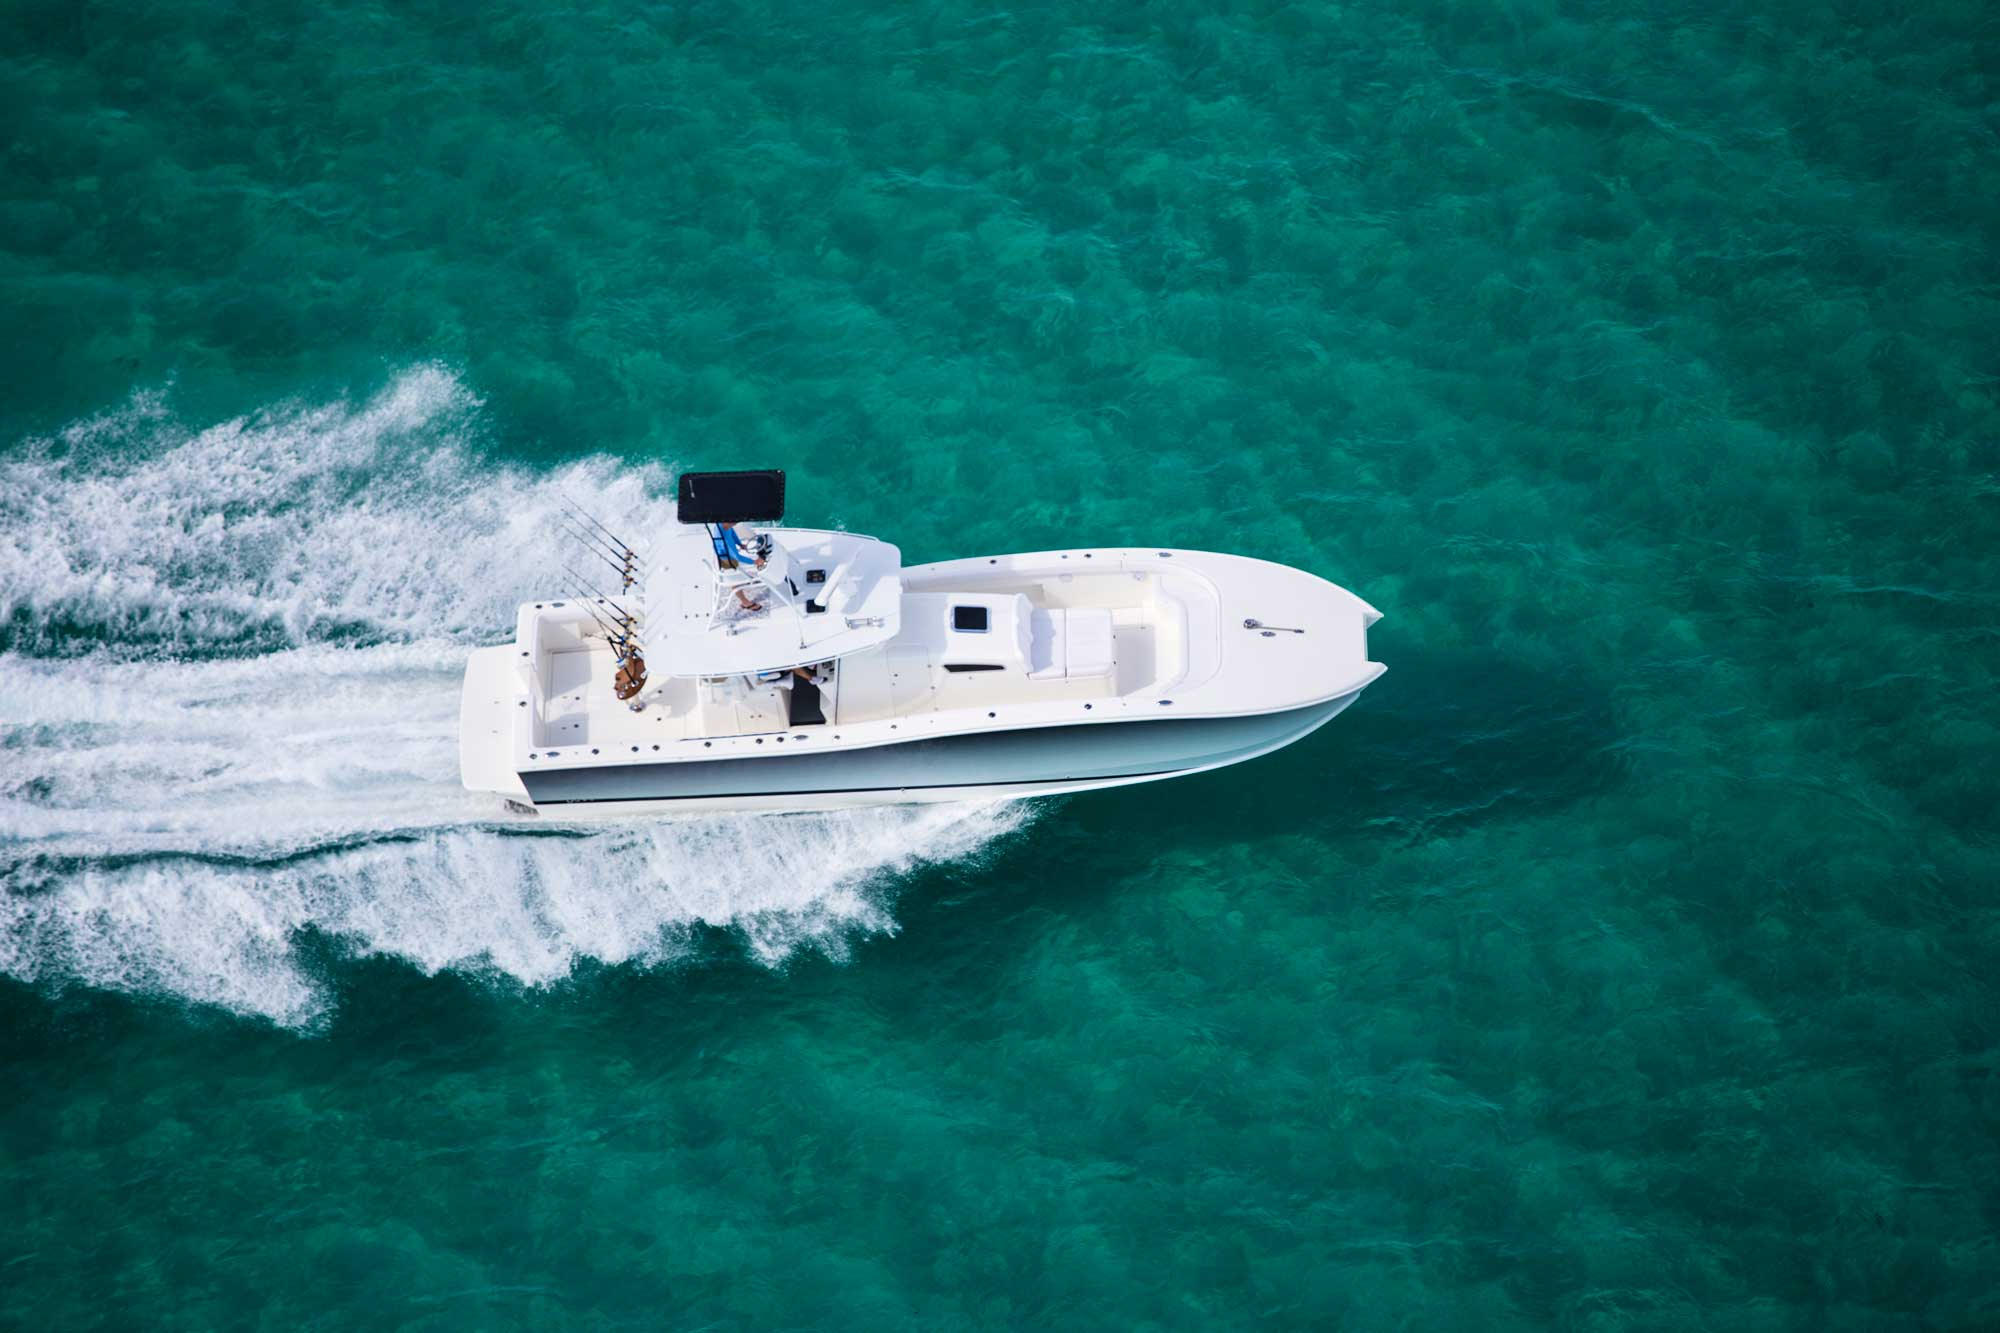 insetta-boat-blue-ocean